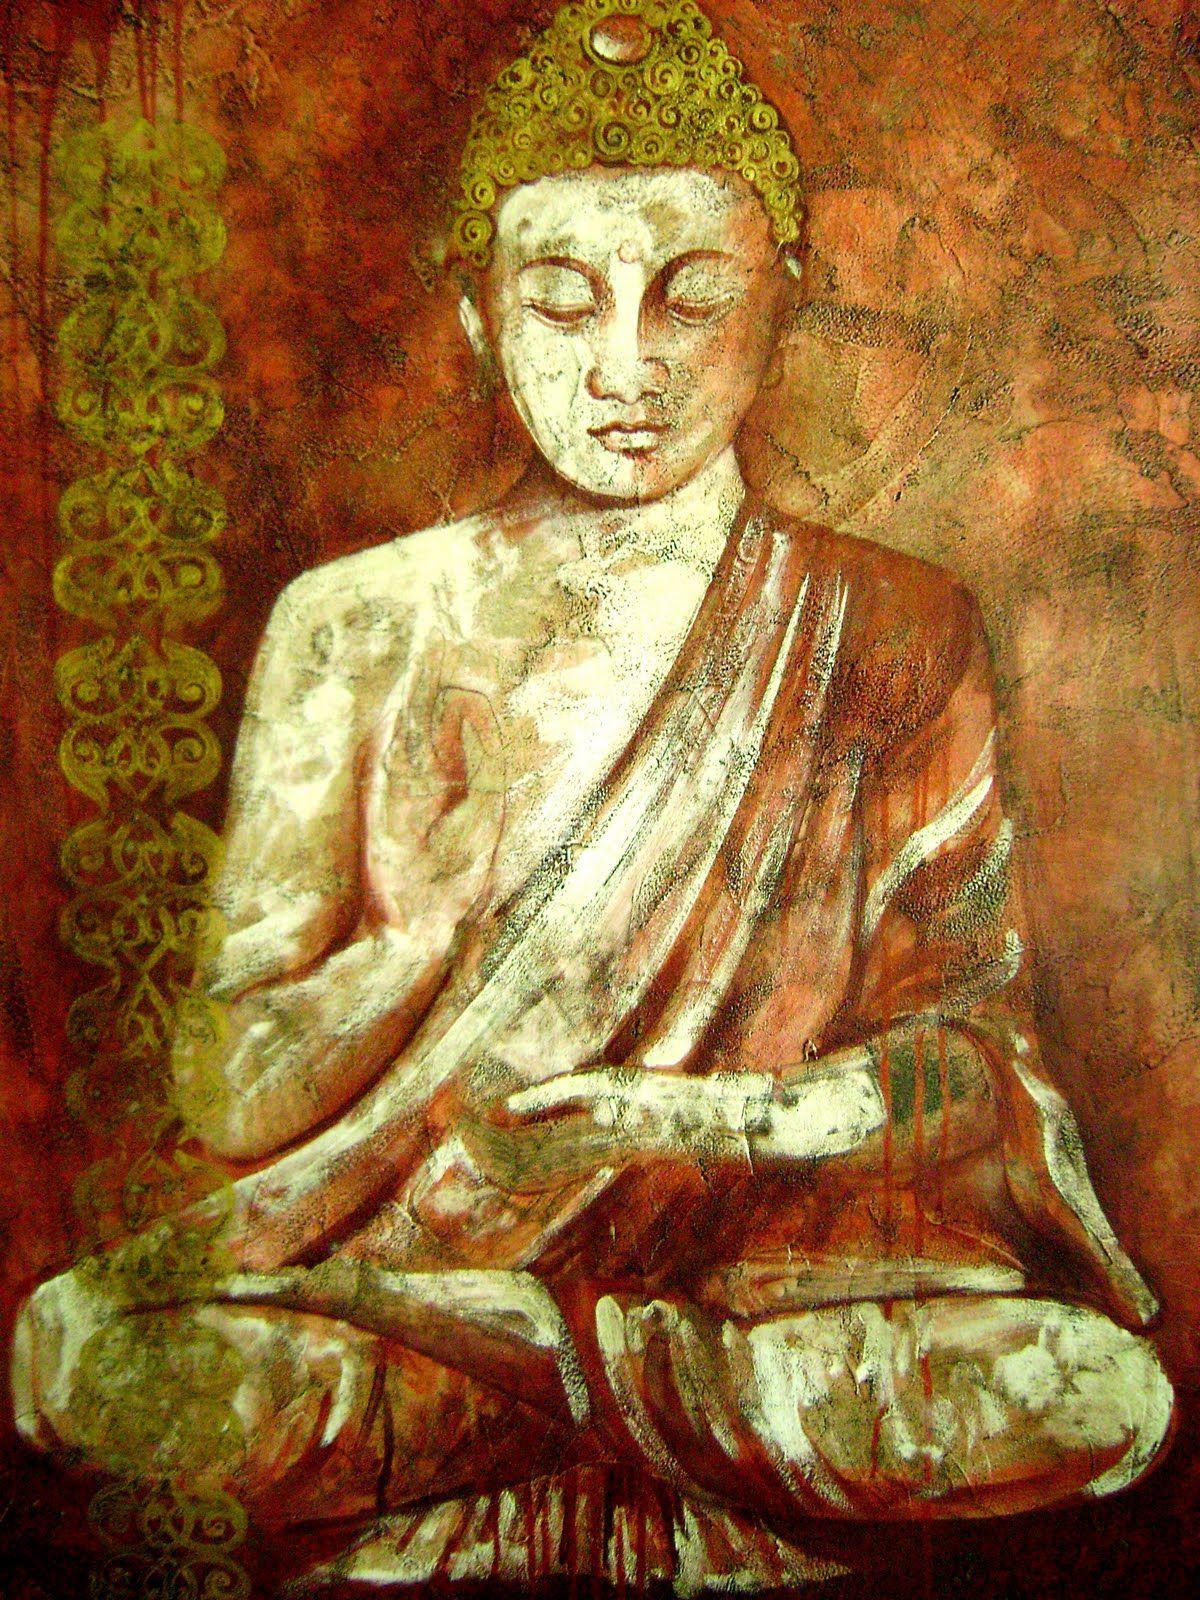 Pin By Diana Rasmussen On Buddha - Pinterest - Buddha,